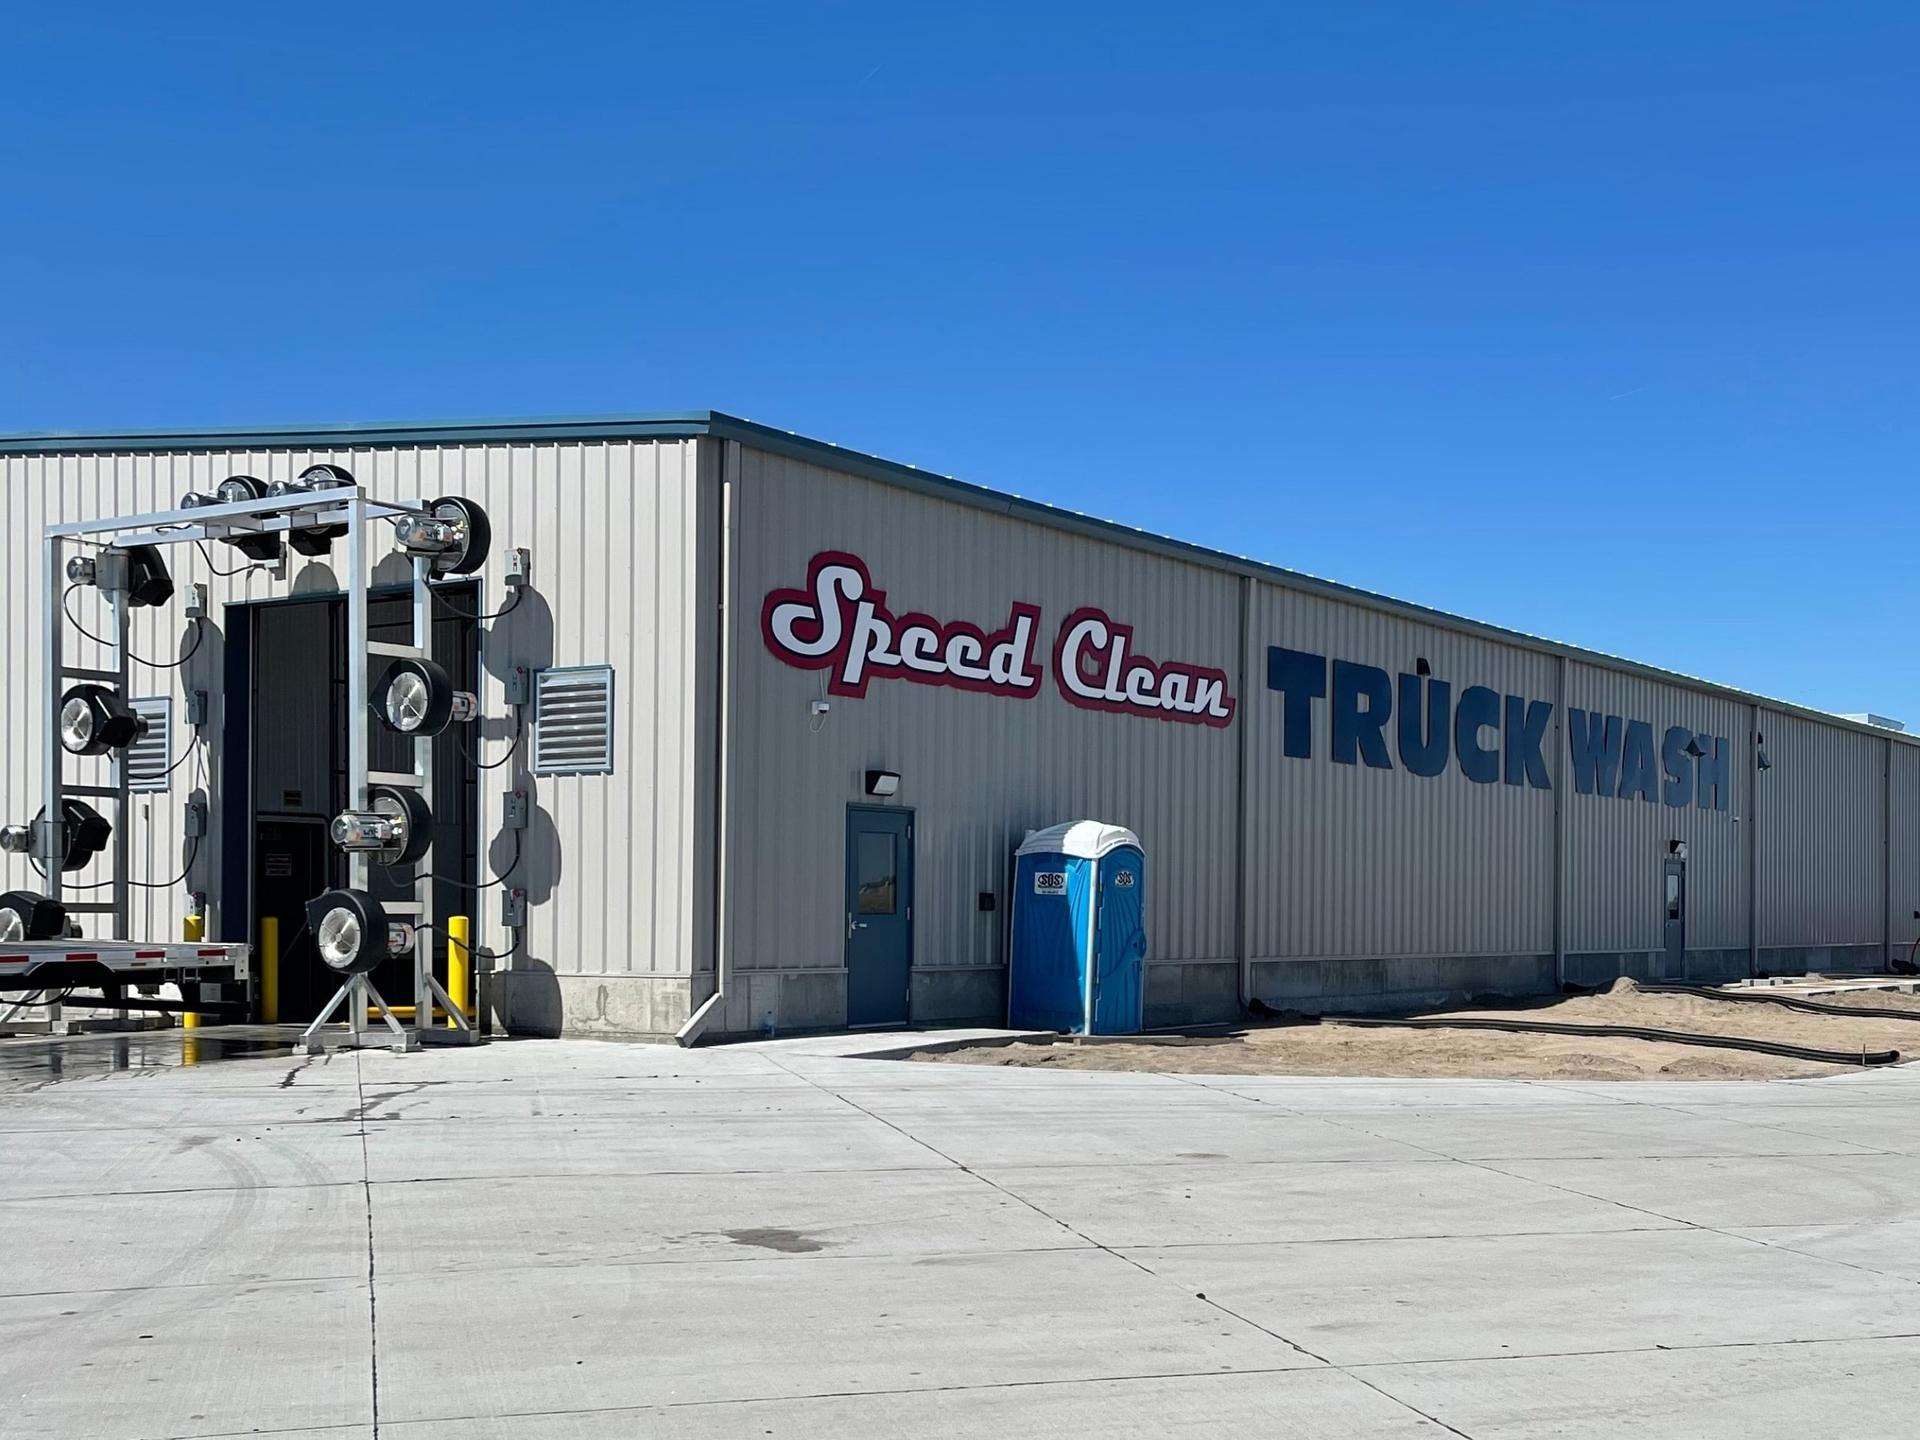 Speed Clean Truck Wash (@speedcleantruckwash) Cover Image